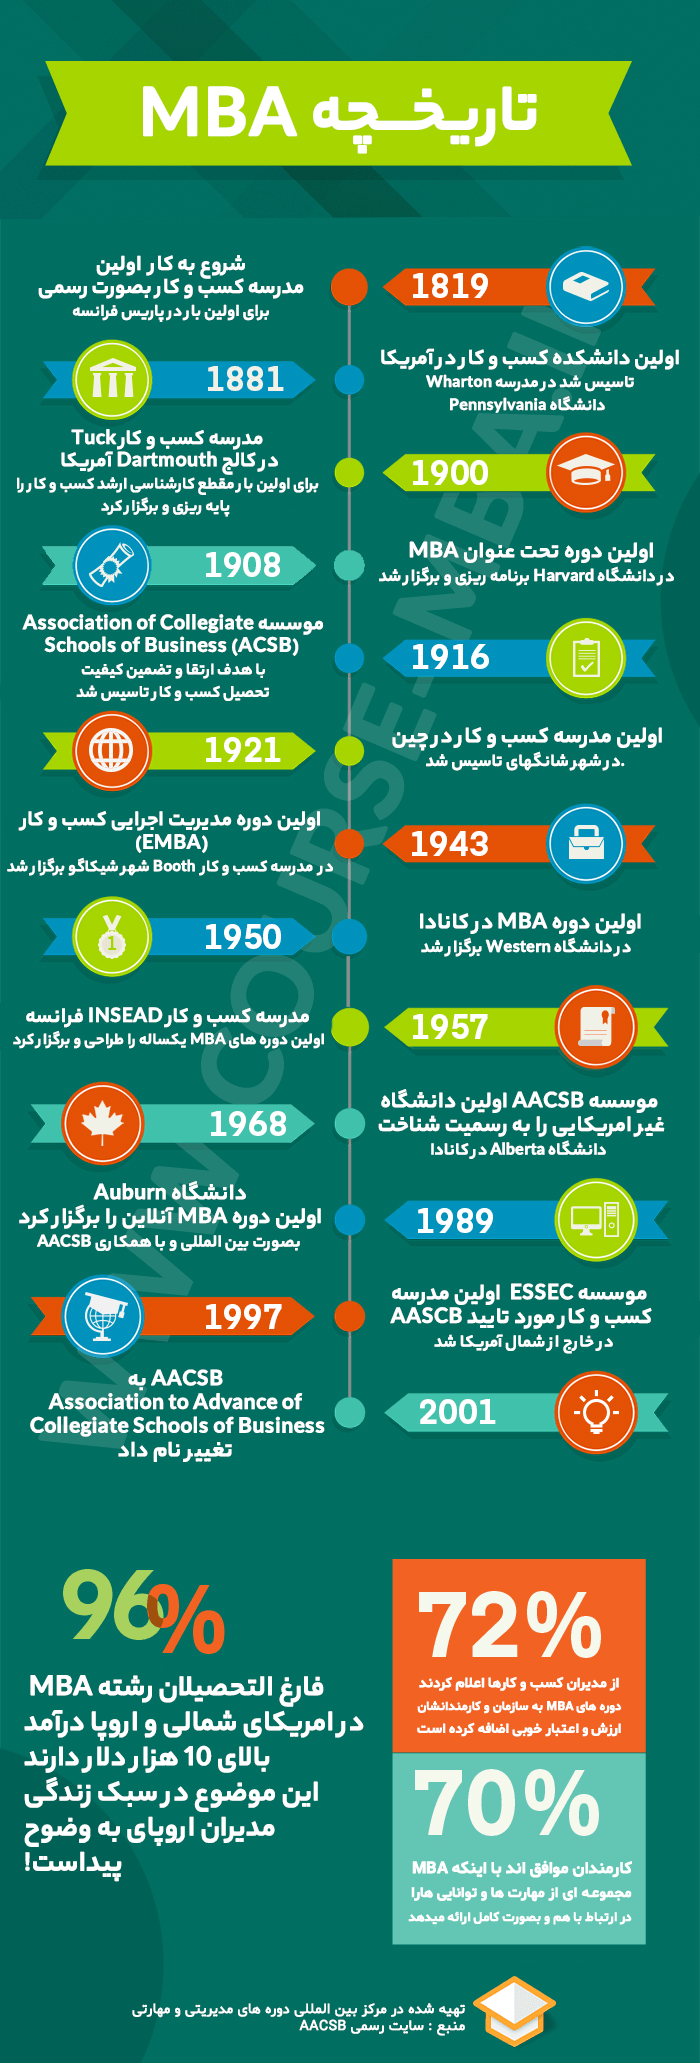 اینفوگرافیک تاریخچه mba